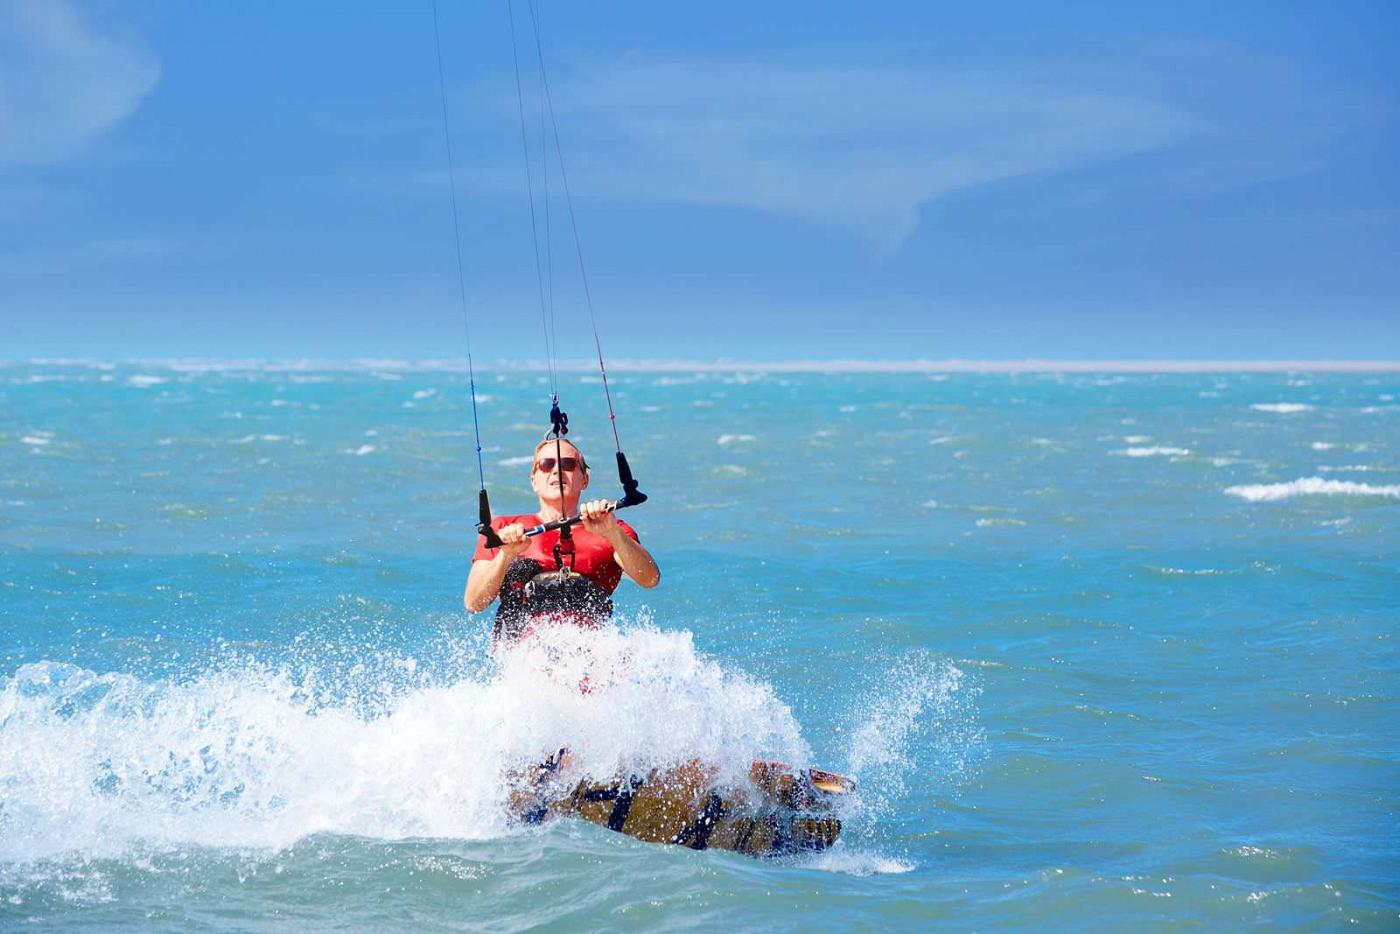 LFG-Kitesurfing